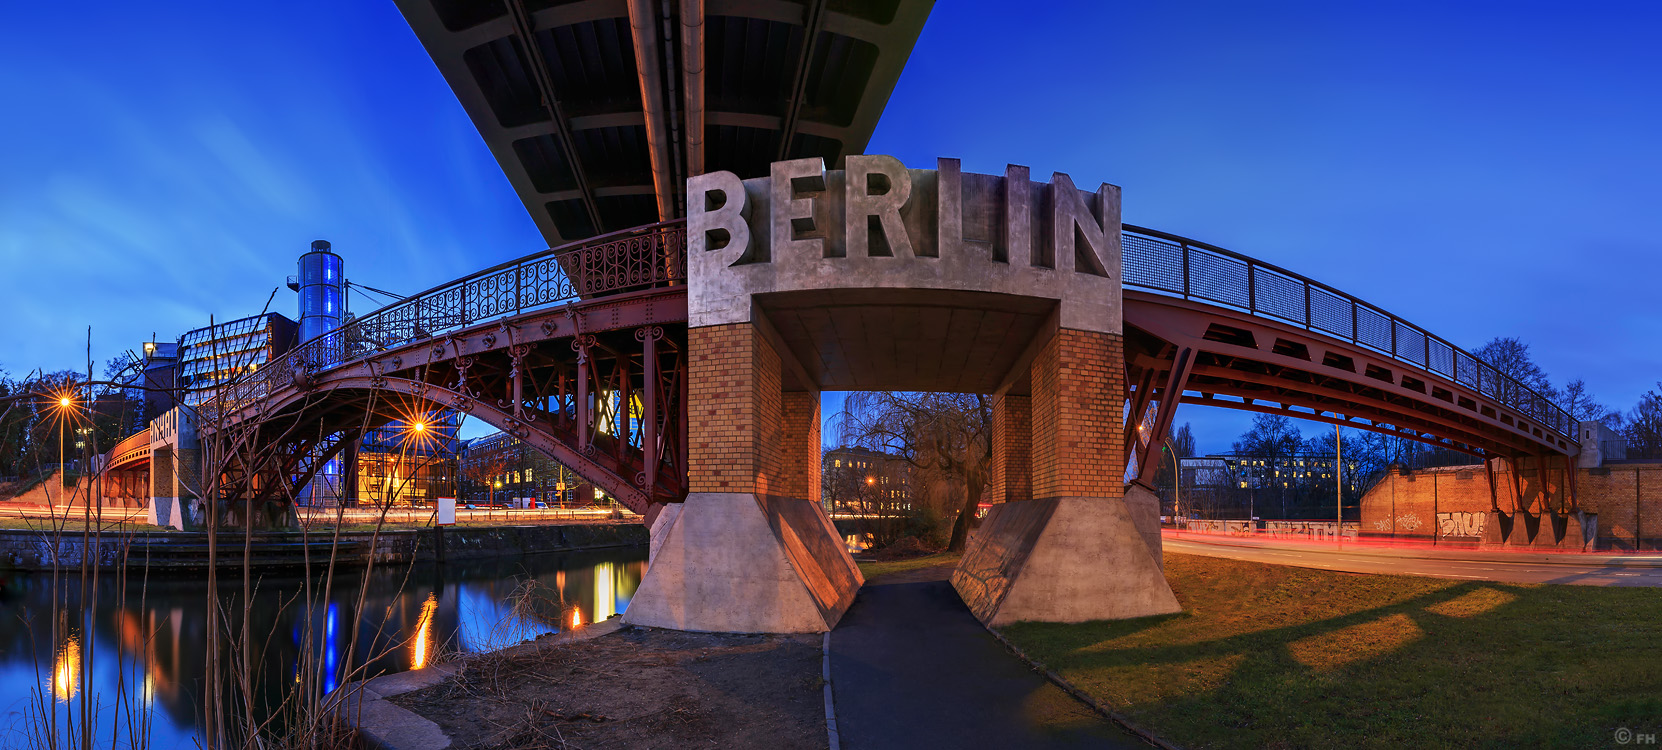 BErlinSign_Pano_k